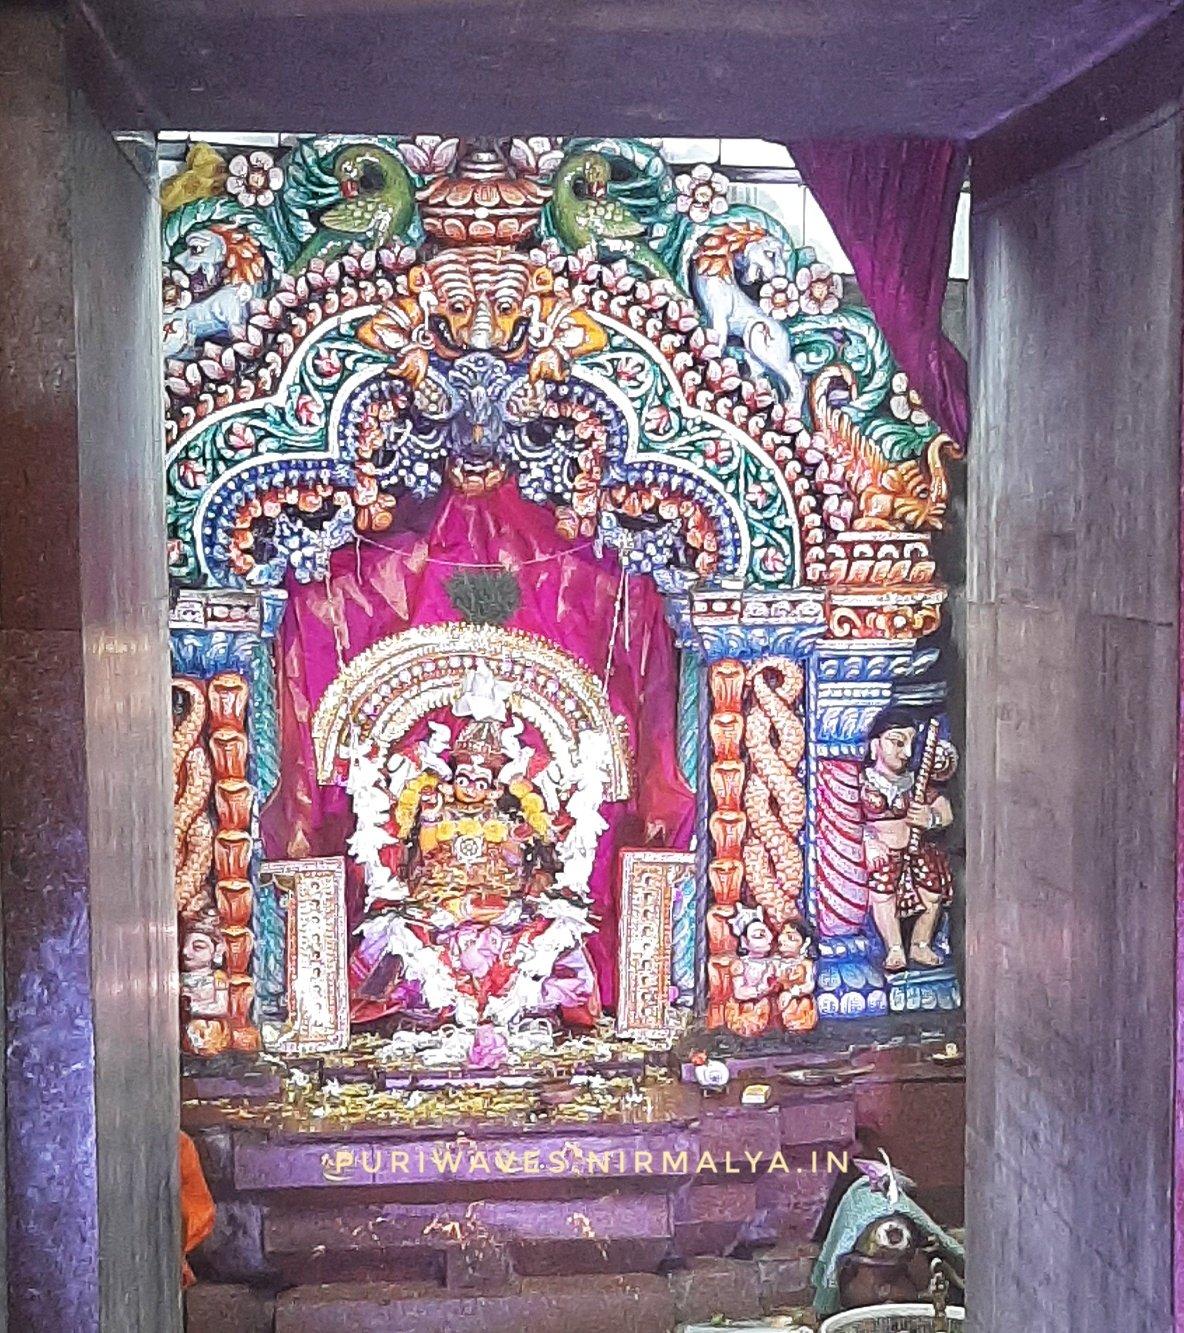 ଗଜଲକ୍ଷ୍ମୀ ବେଶ Gajalaxmi Besha of Marchi Goddess